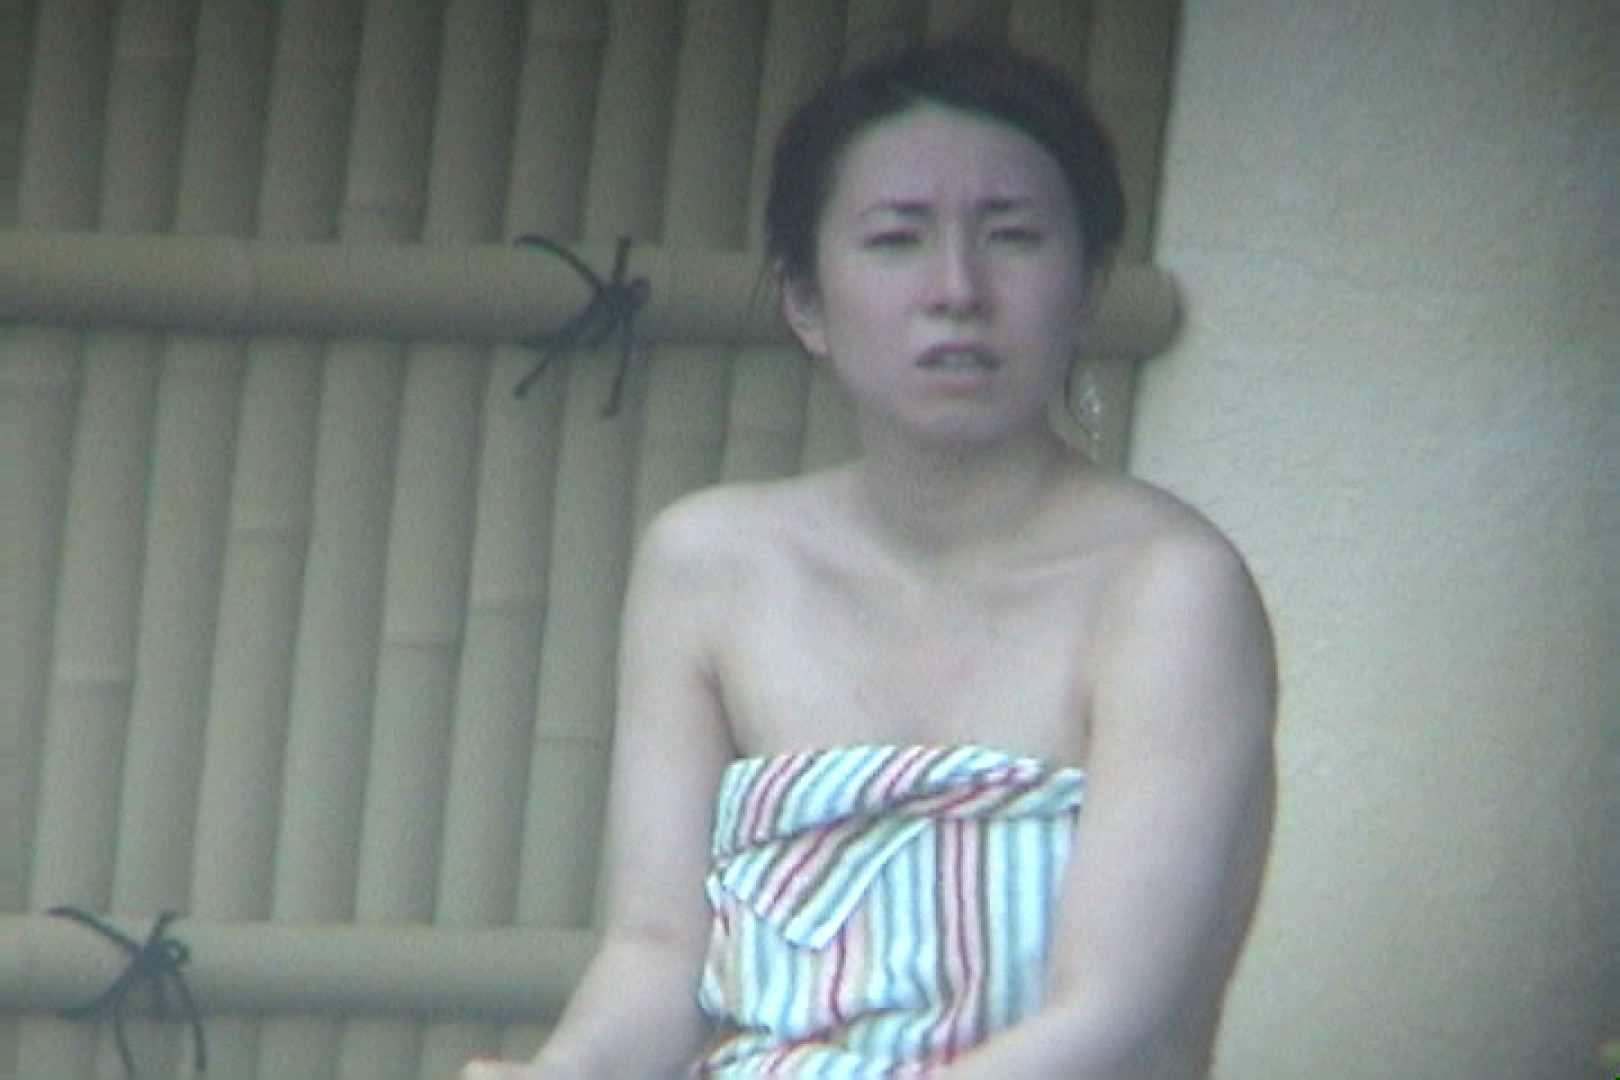 Aquaな露天風呂Vol.106 いやらしいOL アダルト動画キャプチャ 70連発 6